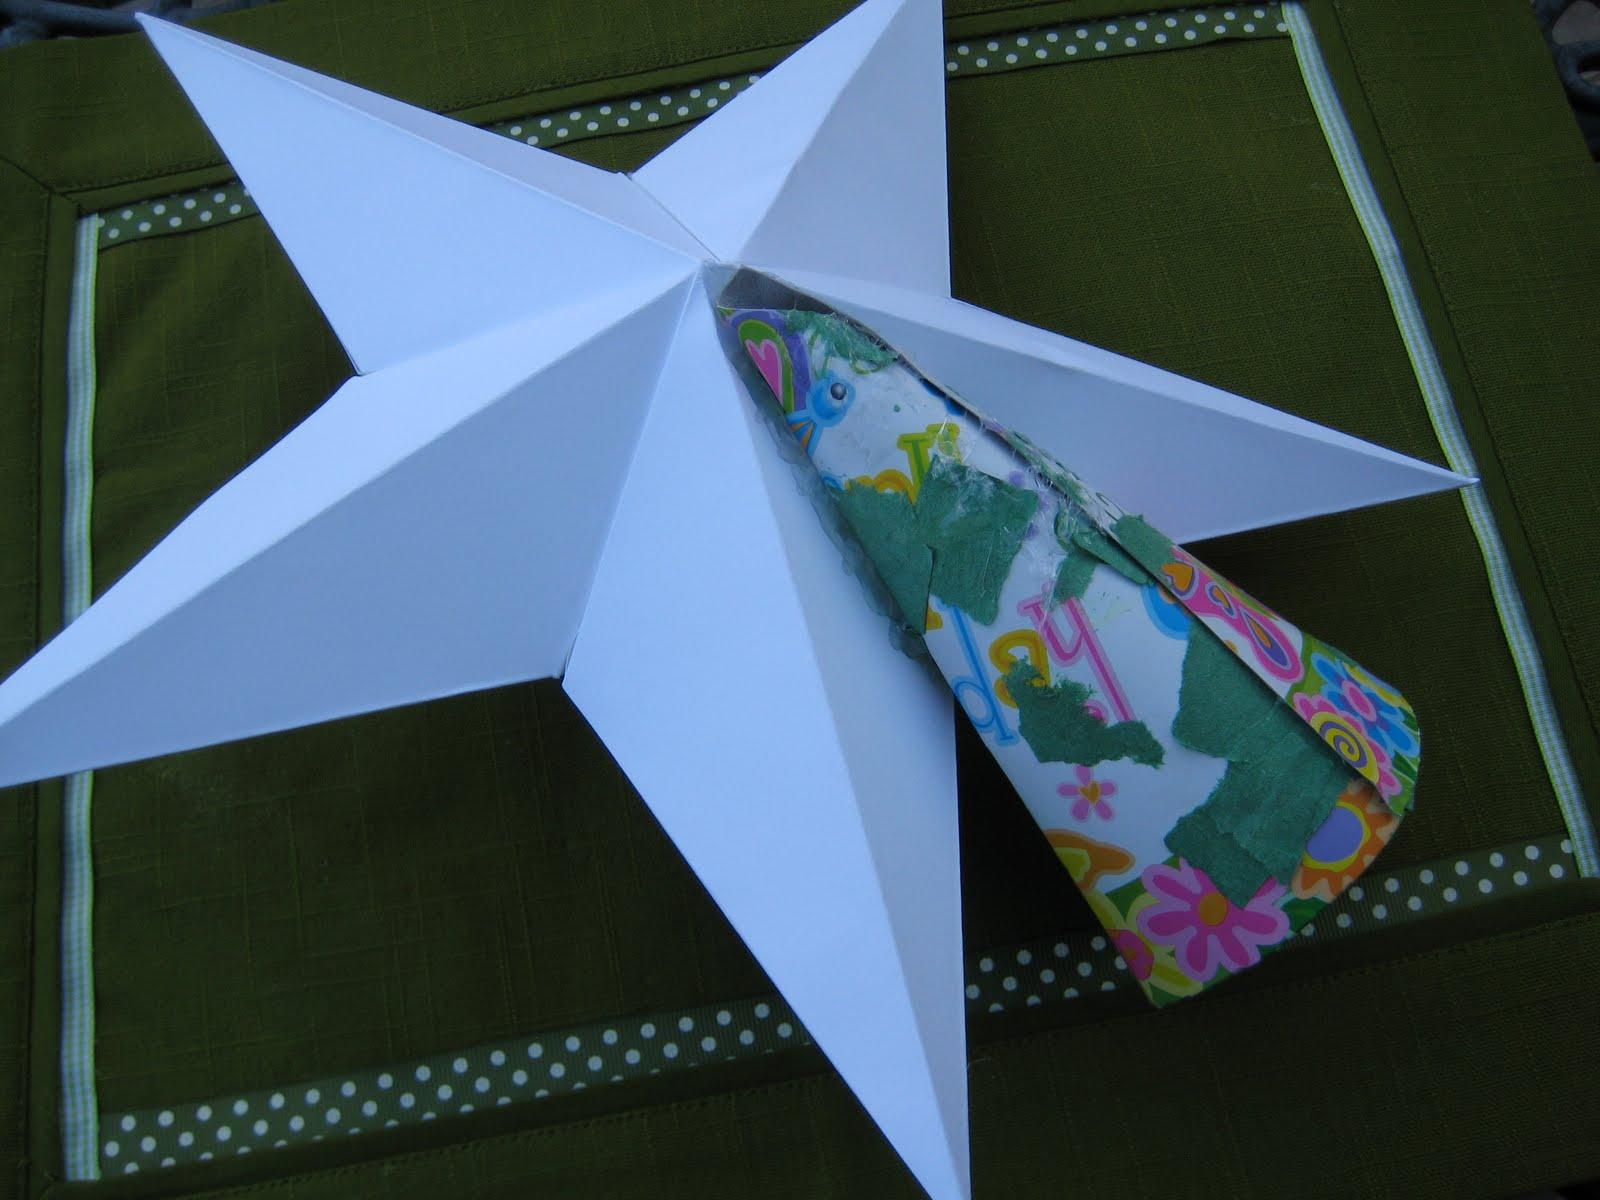 Leaf And Letter Handmade: No Budget Christmas Decor: Star